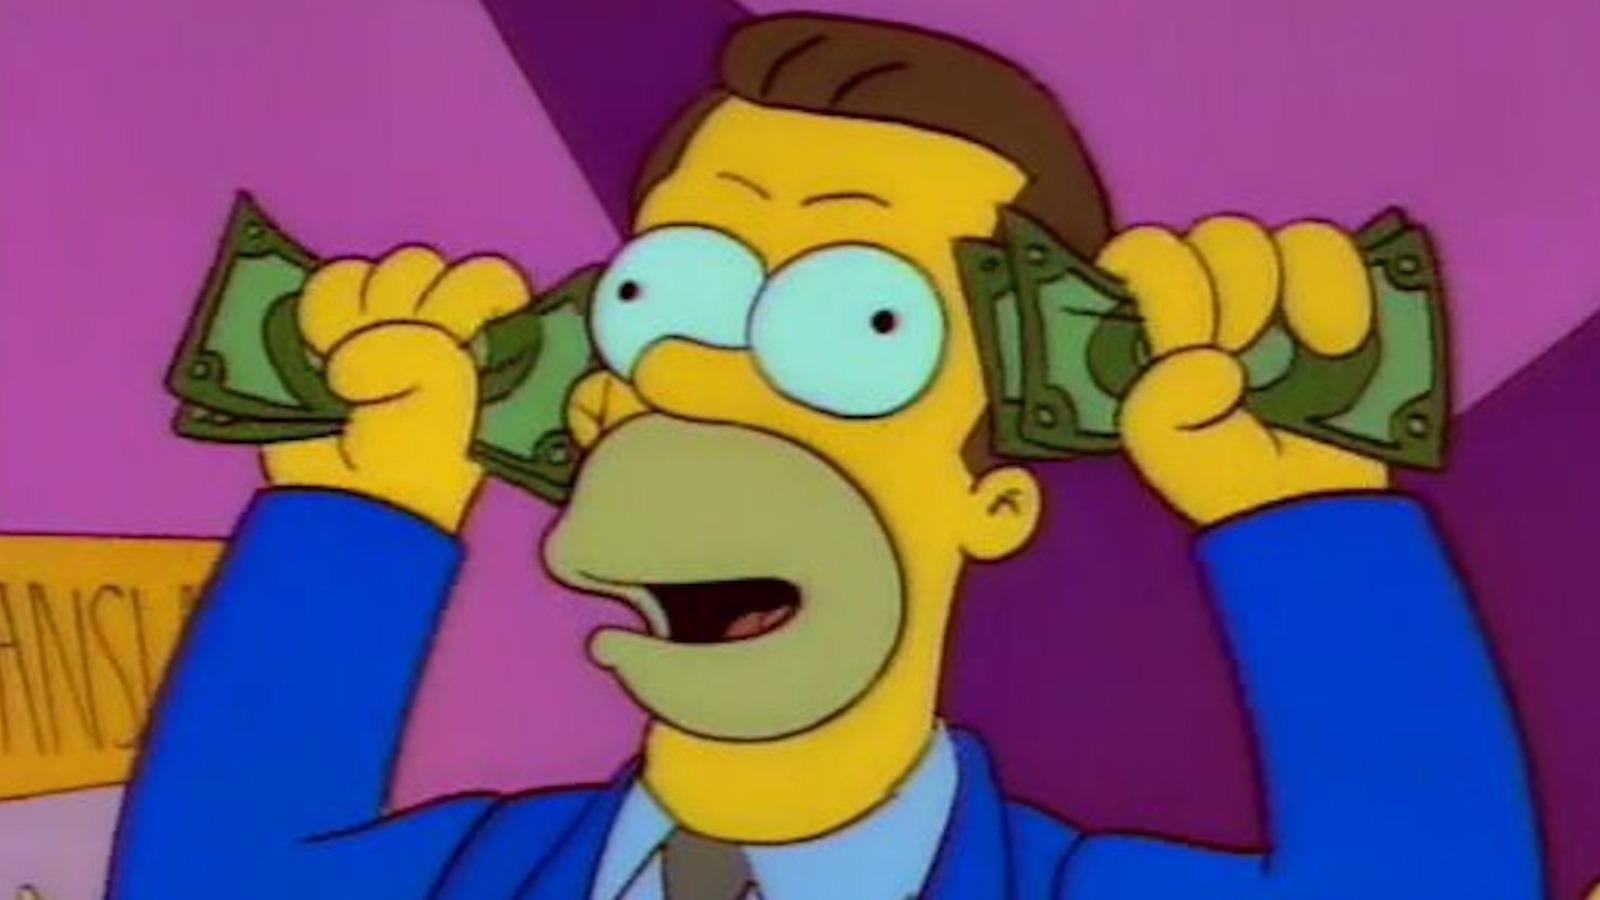 The Simpsons: Apu Voice Actor Hank Azaria Wont Play